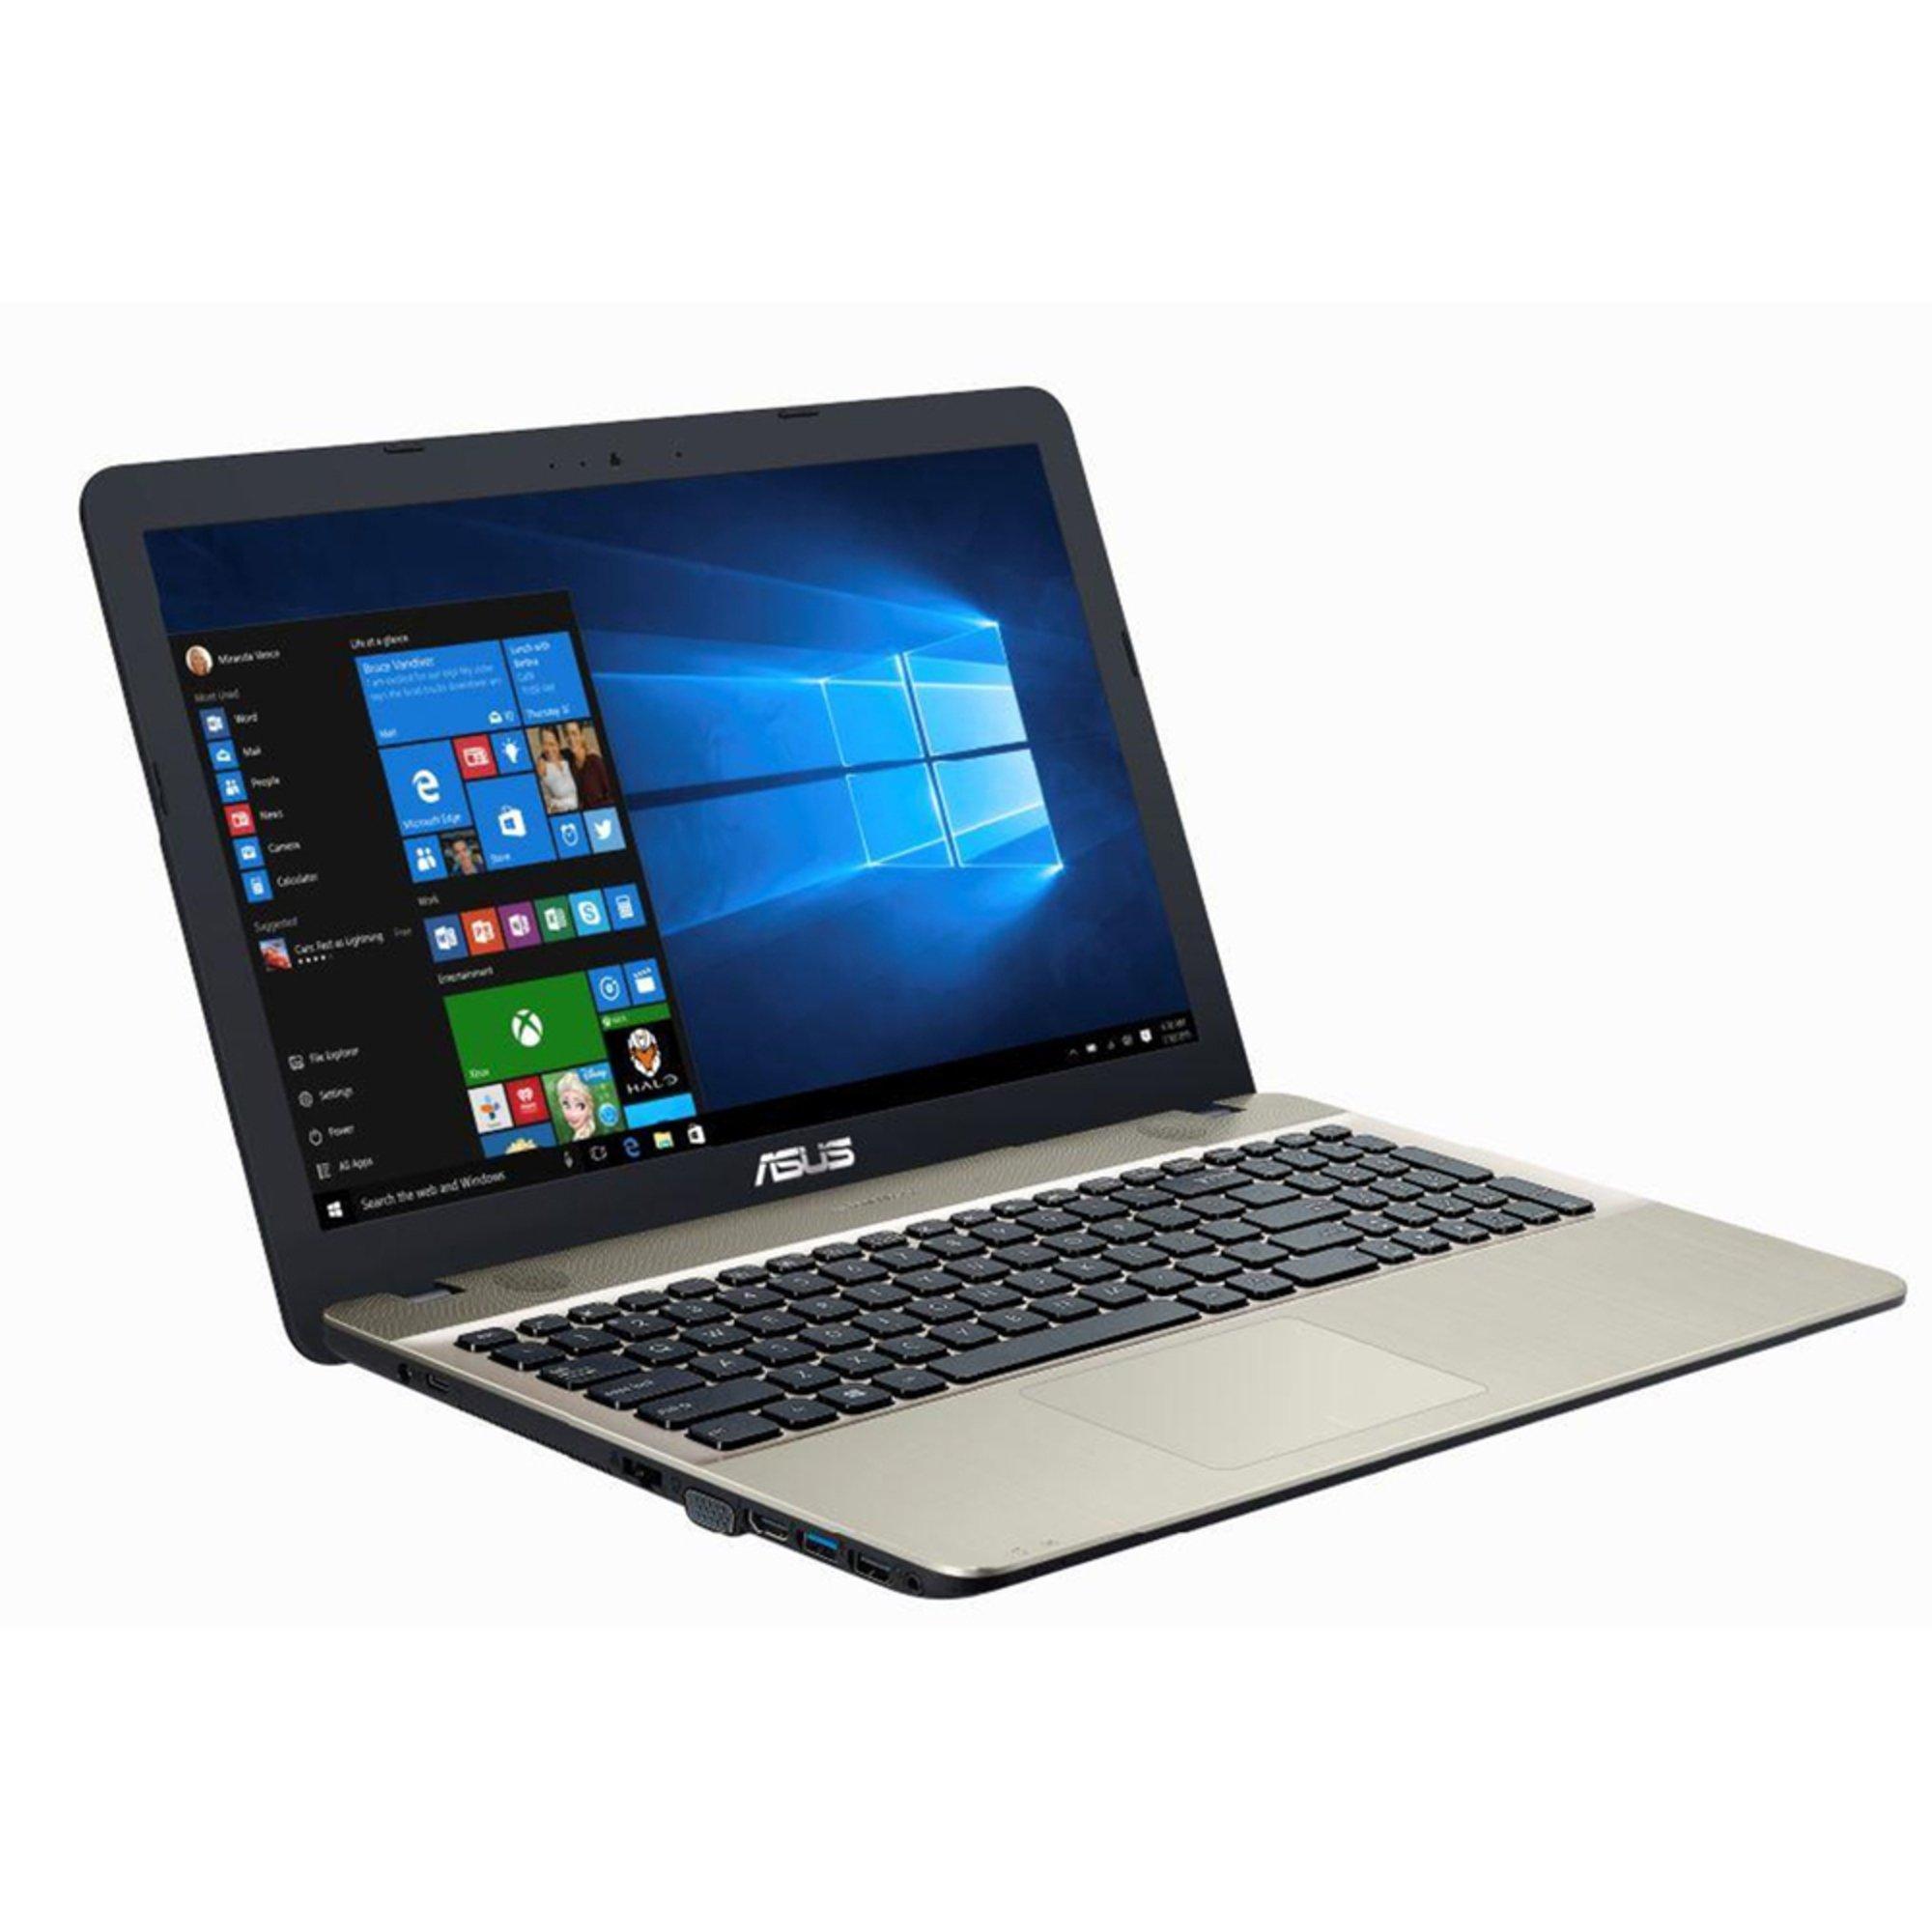 Notebook samsung dual core 4gb - Asus Asus 15 6 Notebook Intel Dual Core